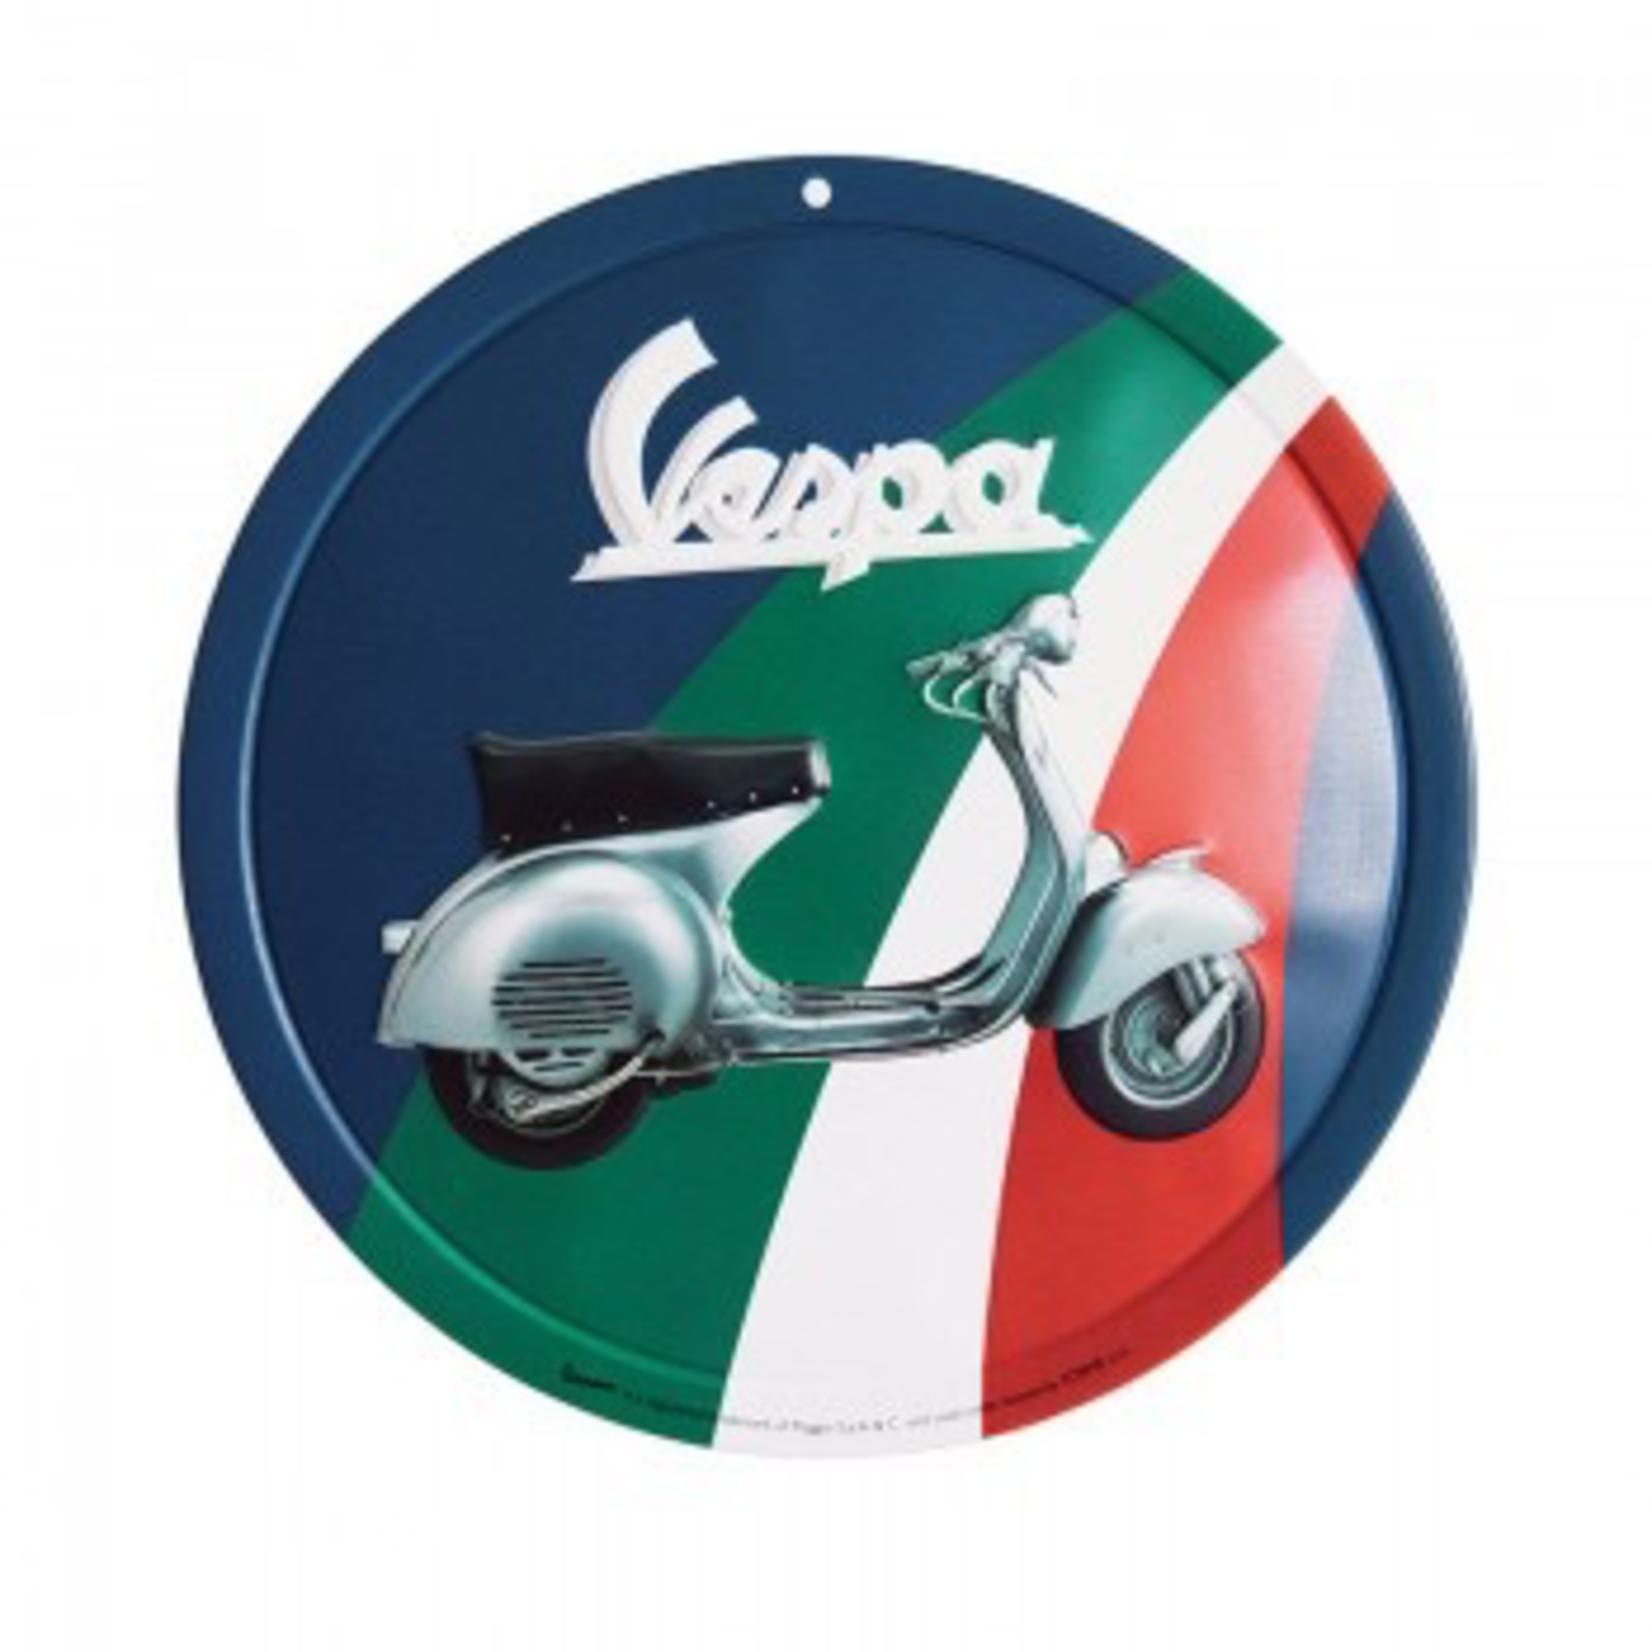 Lifestyle Sign, Metal Vespa Tricolore Green/White/Red